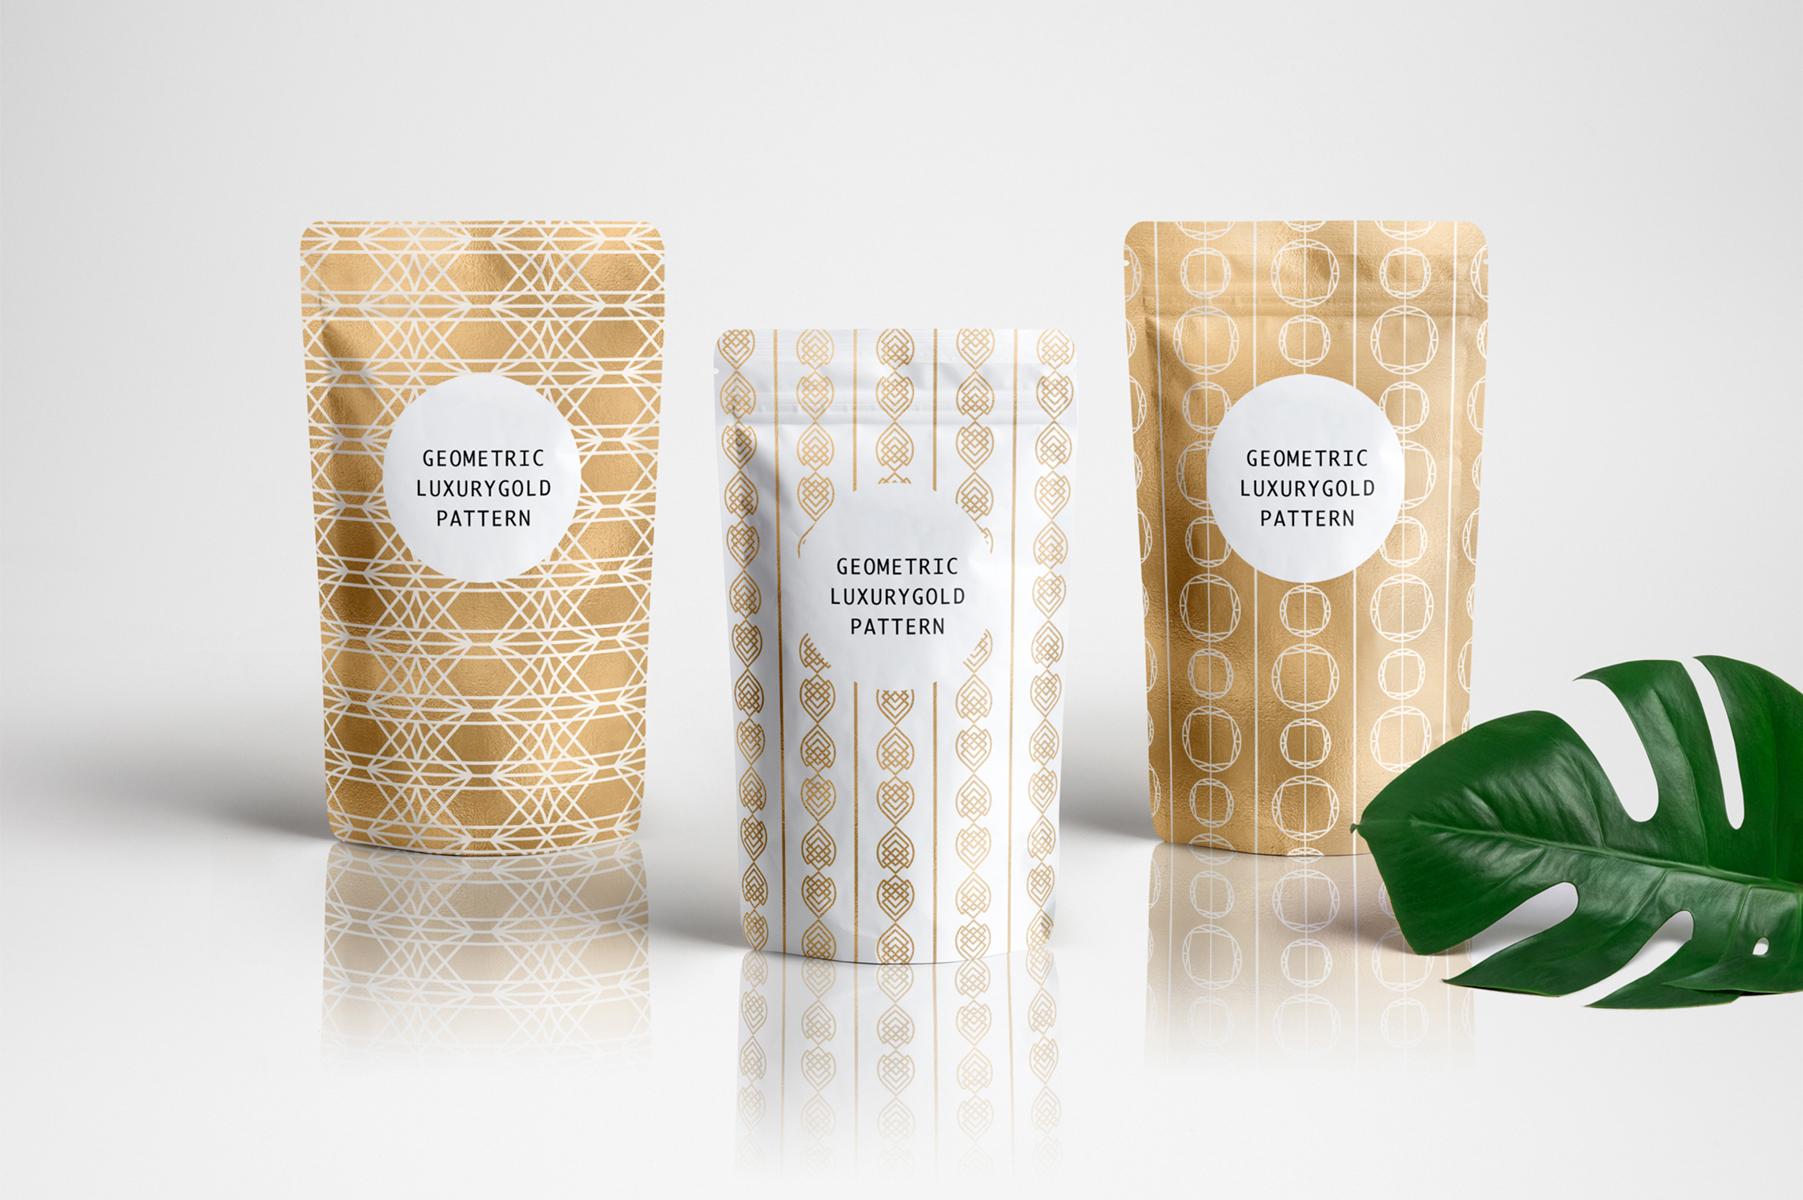 Geometric Luxurygold Patterns